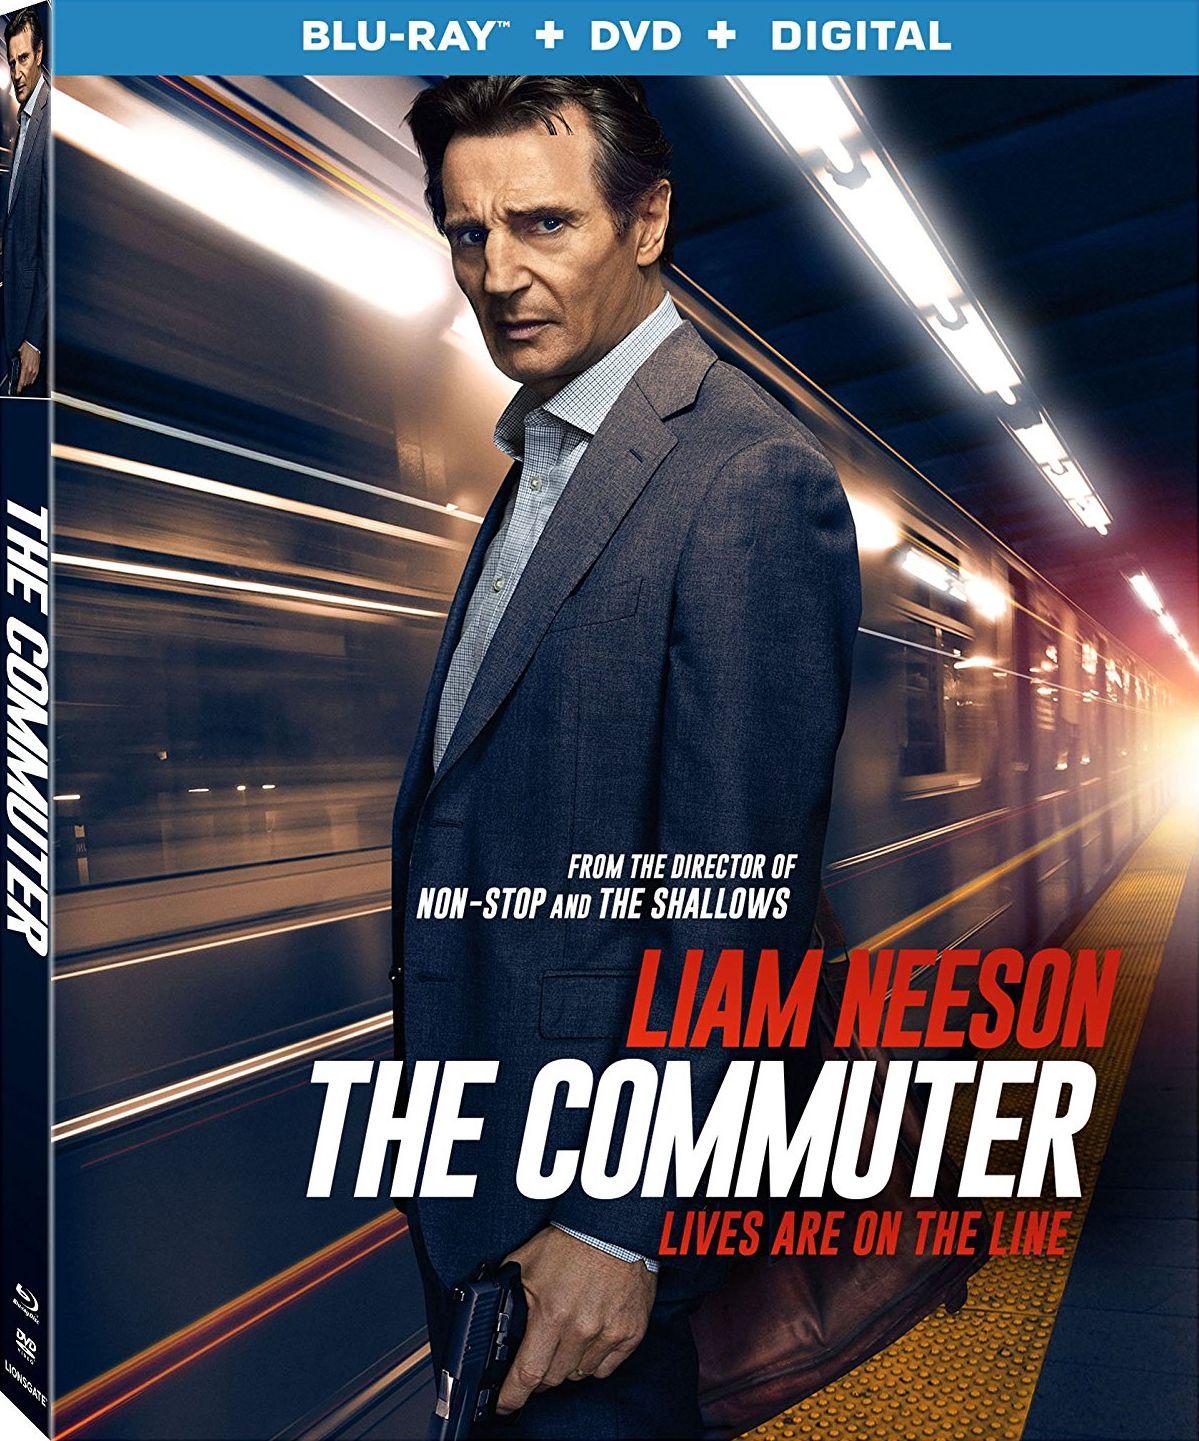 The Commuter Blu Ray Lionsgate Blu Ray Liam Neeson Blu